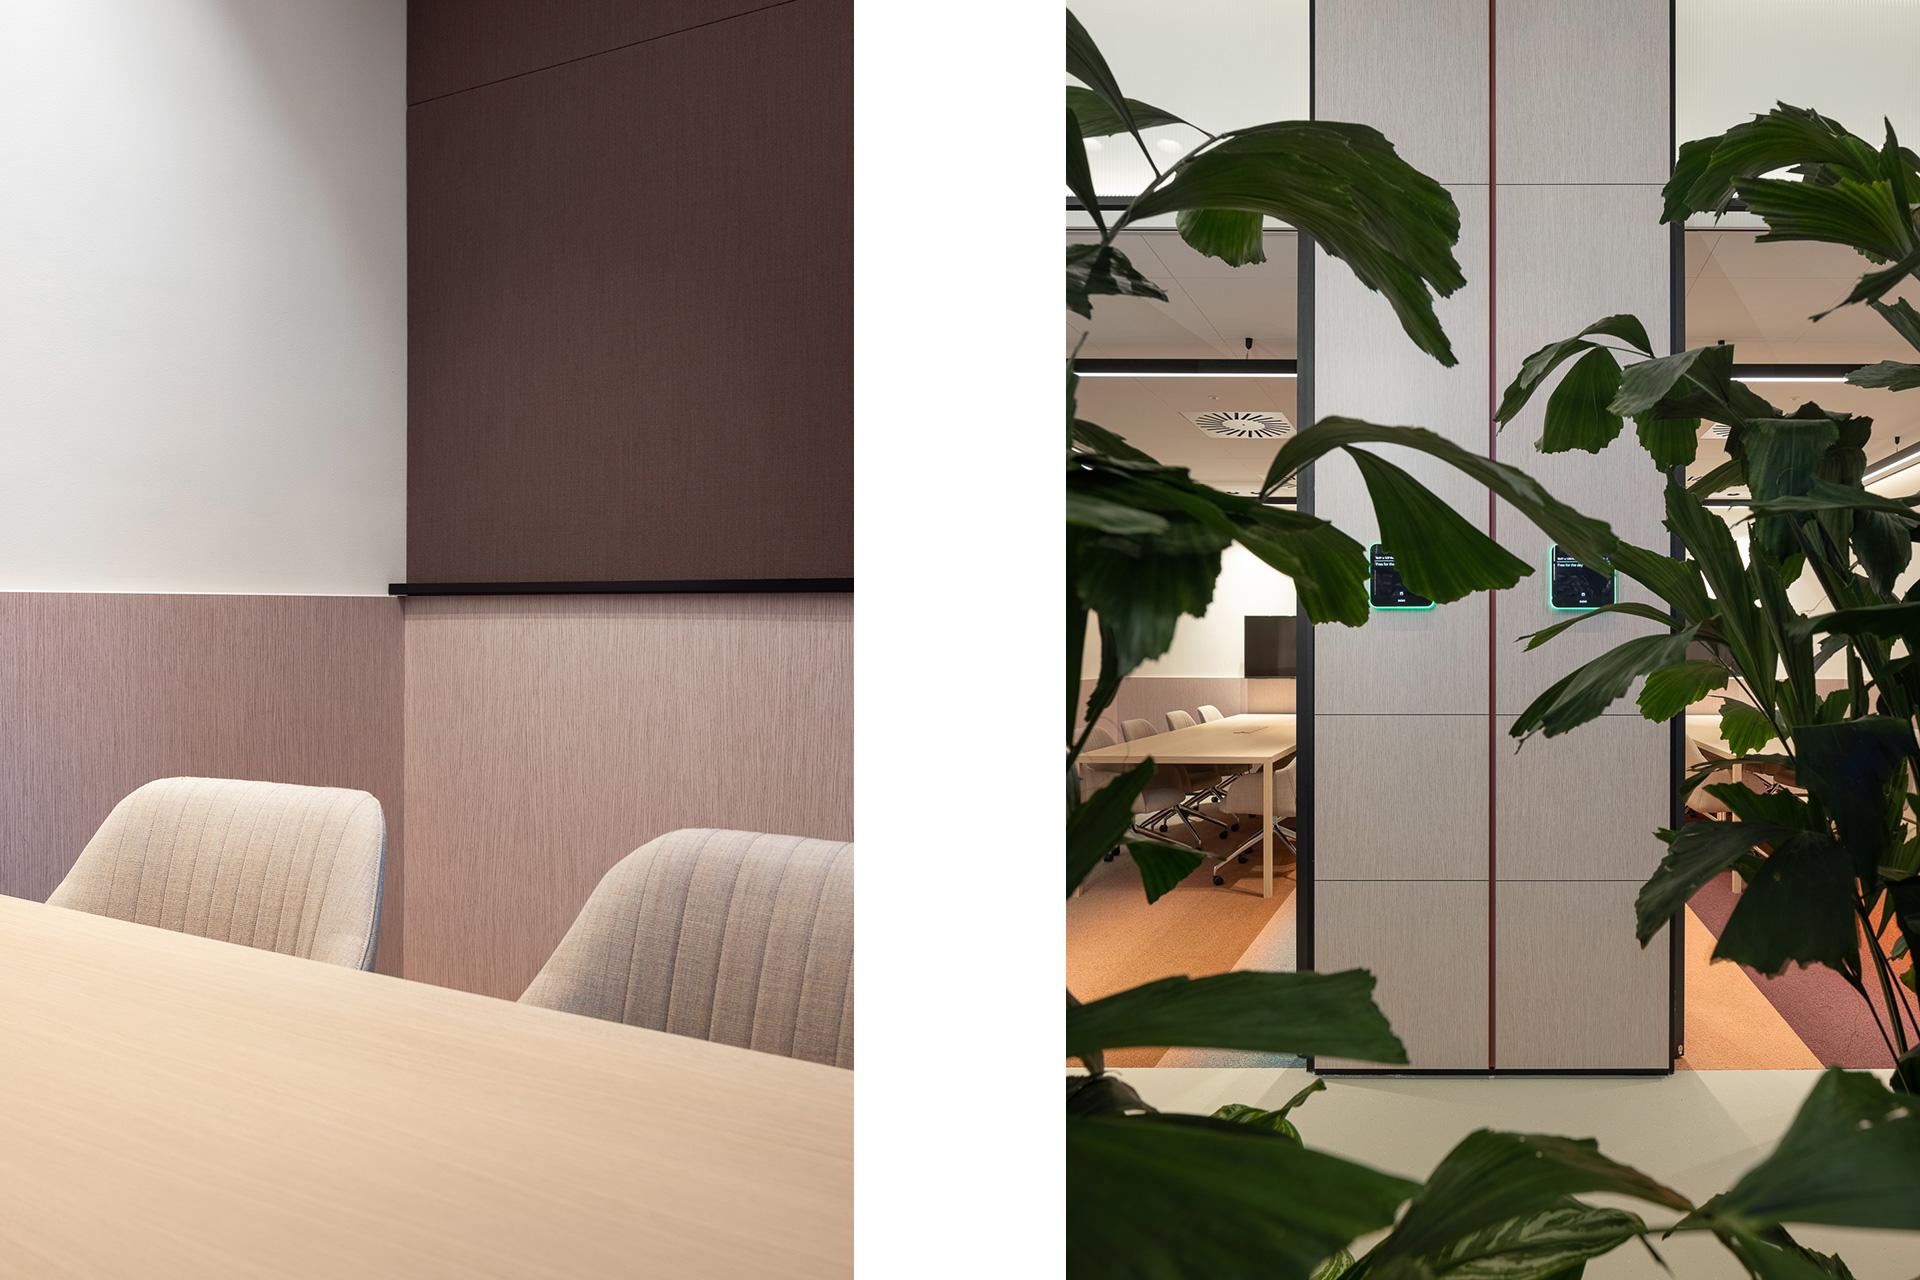 SP2020-Guerrilla-Games-Amsterdam-Office-Interieurfotografie-16